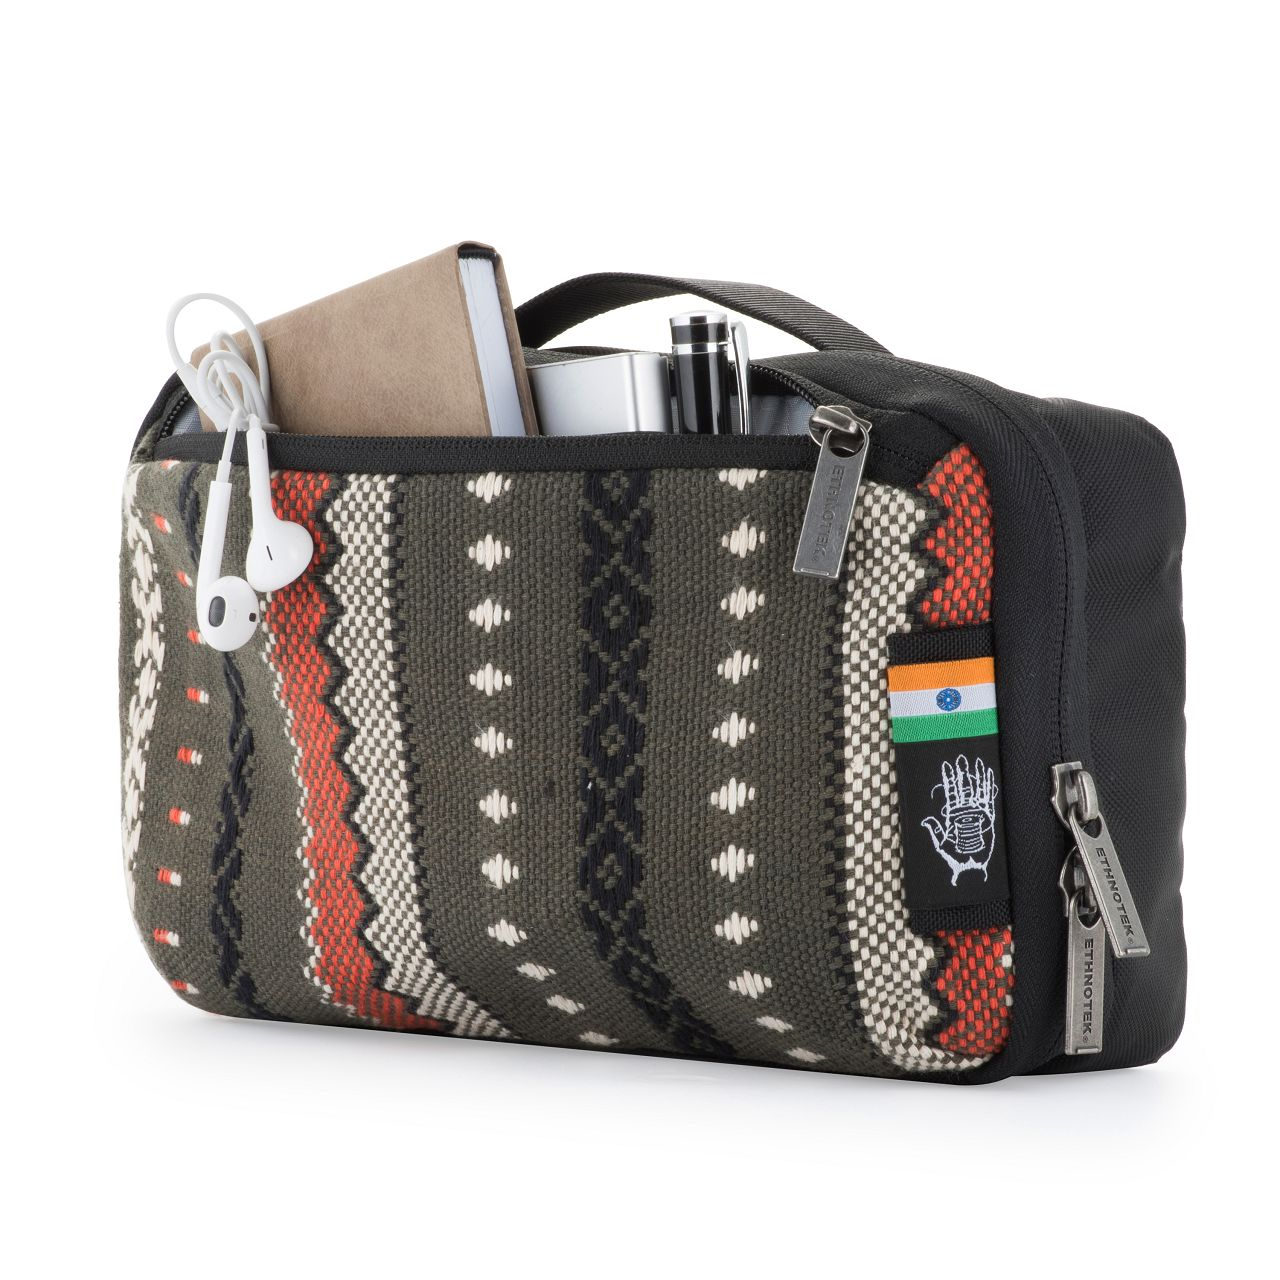 Coyopa Zip Kit Organizer India 12